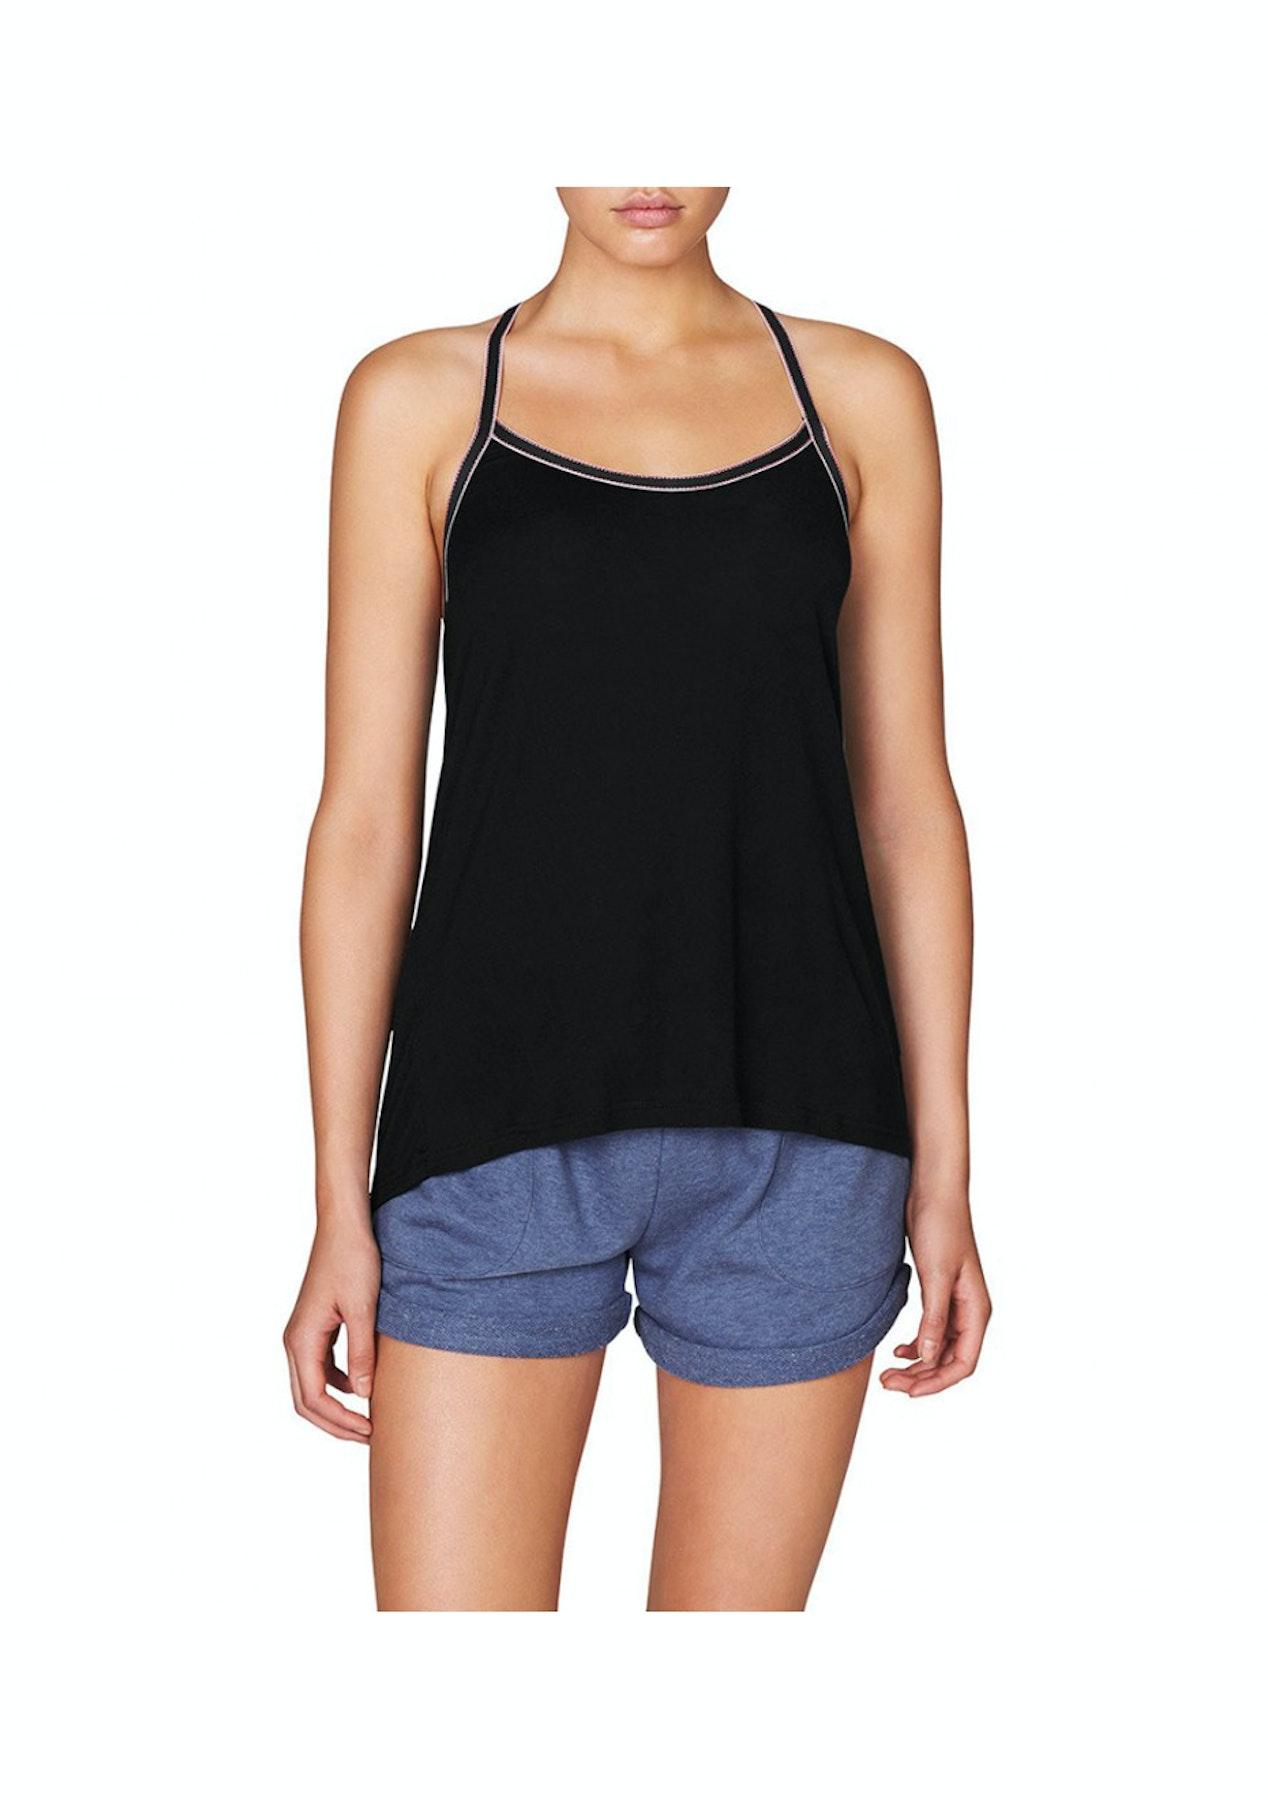 2fe3770e113eb Lovable Womens Sleepwear - Nautical Stripes Slvls Top Singlet - Black True  Nv White Rio Red - Big Brand Underwear   Loungewear - Onceit